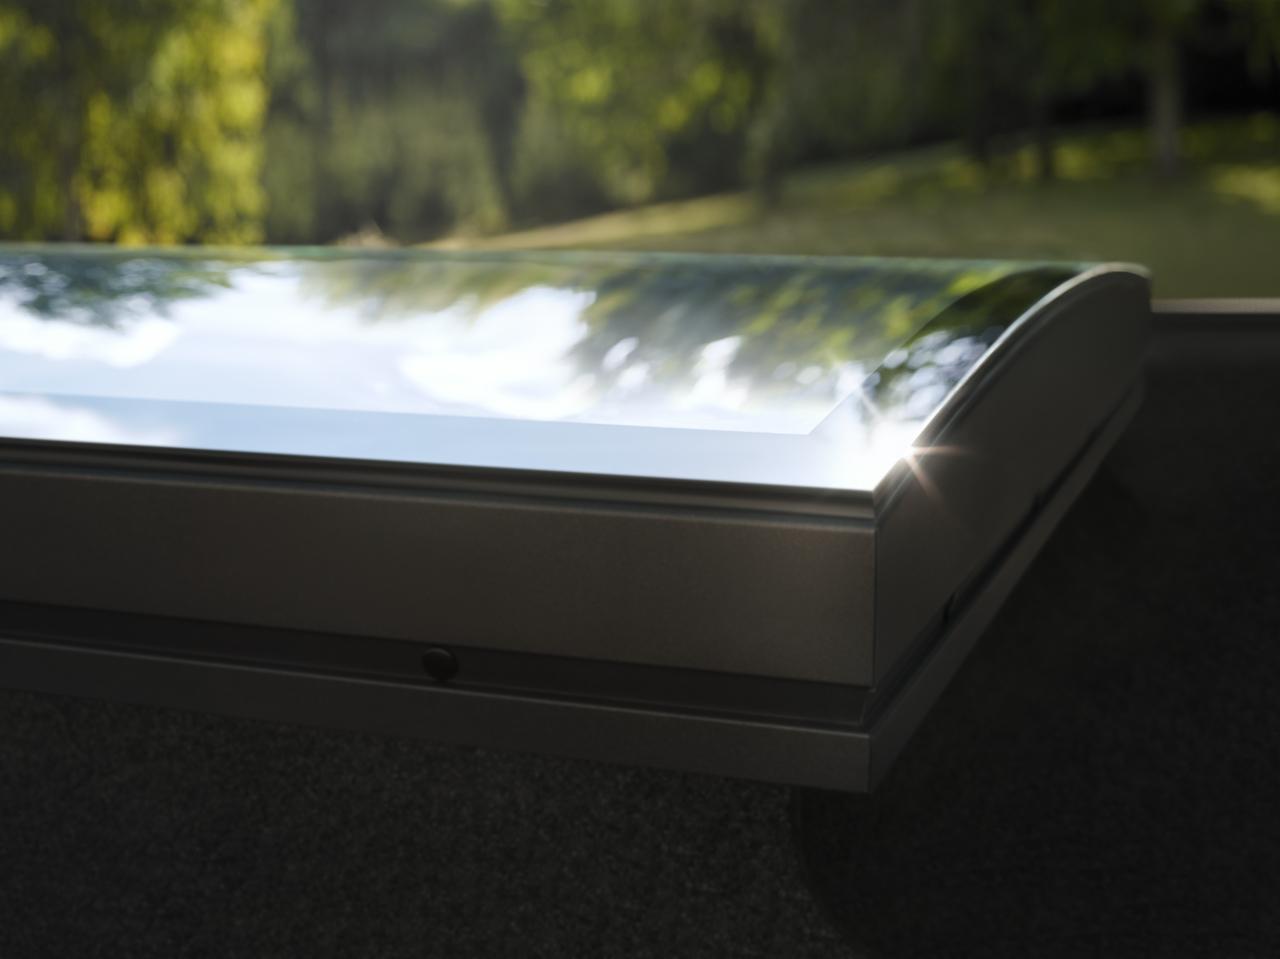 flachdach-fenster konvex glas